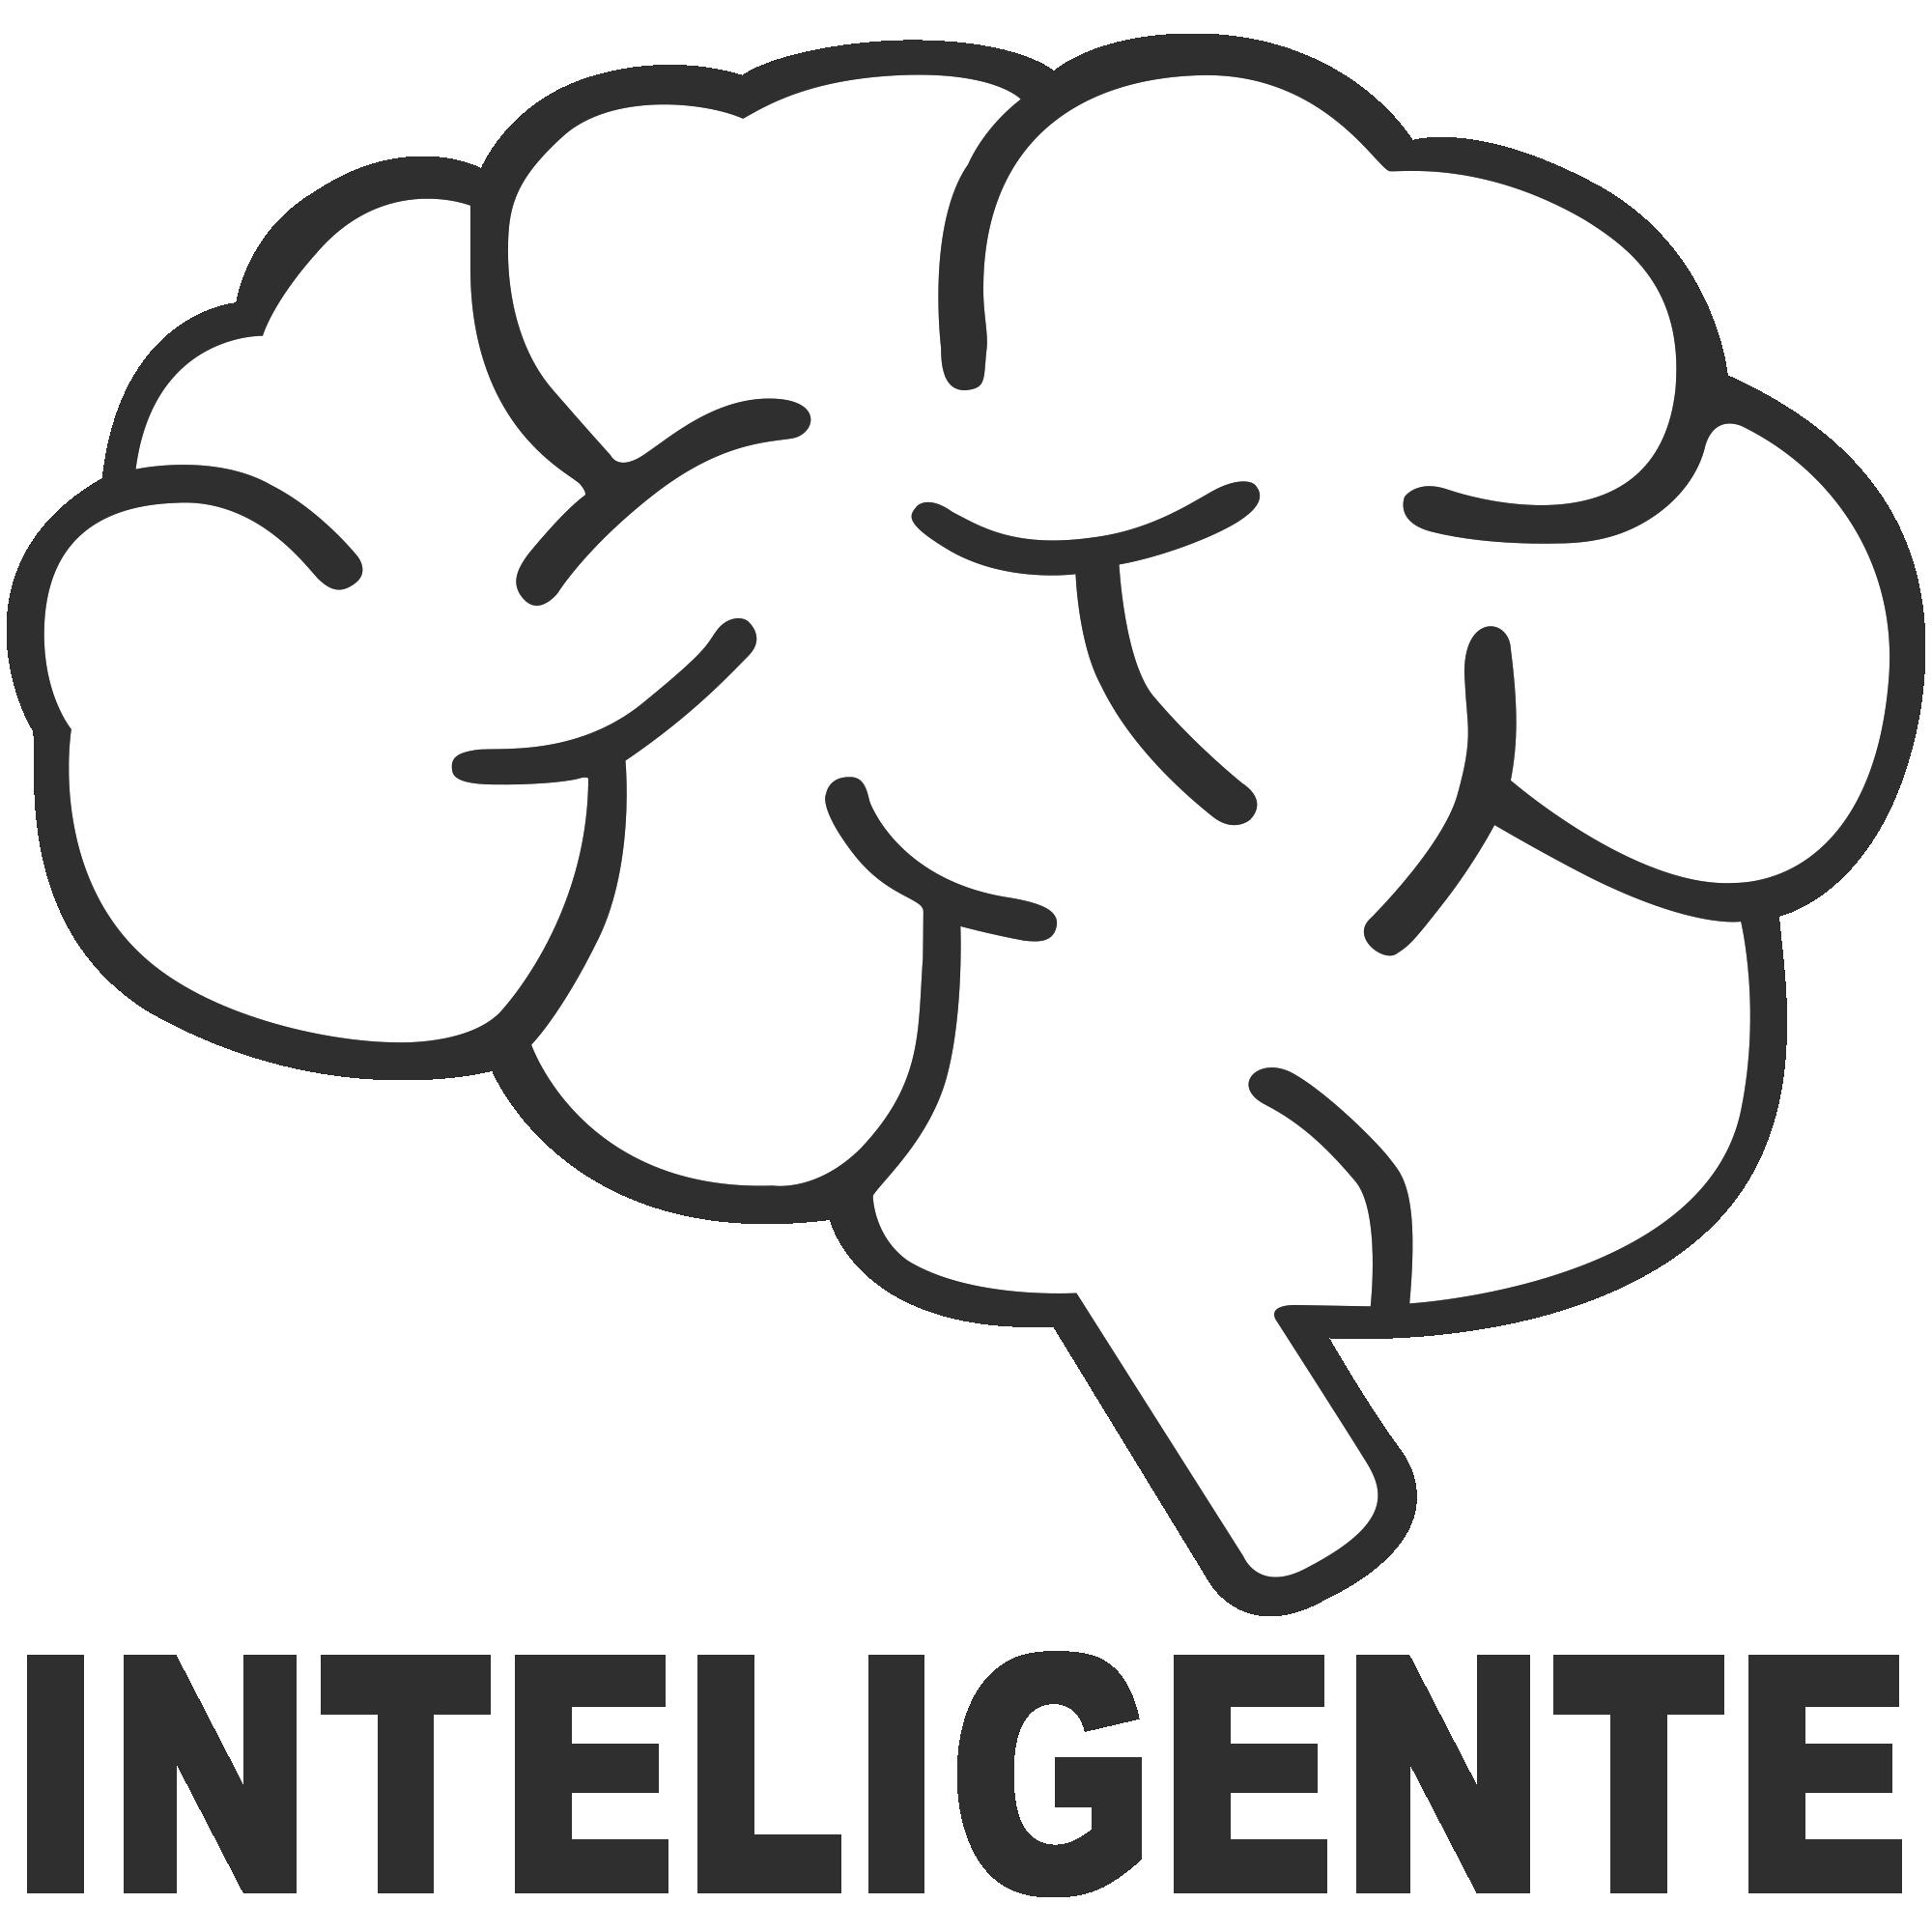 inteligenteecco.png?v=1621466128